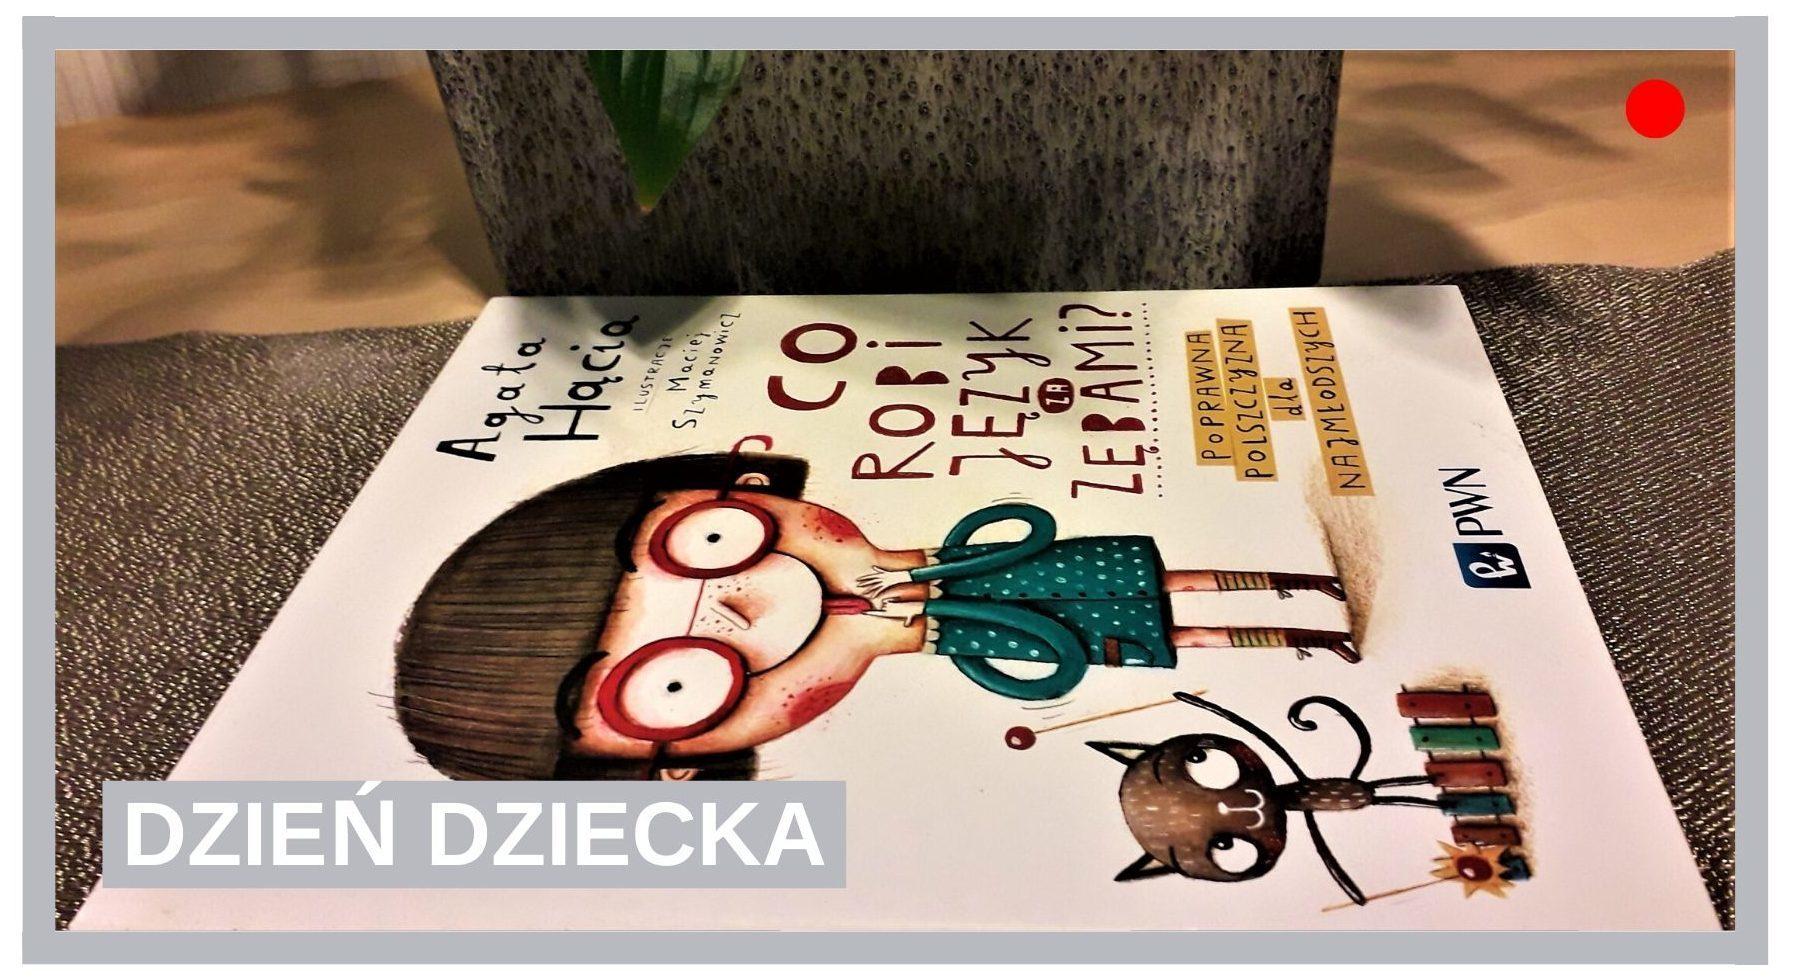 Blog Agnieszka Jasińska - Dzień Dziecka